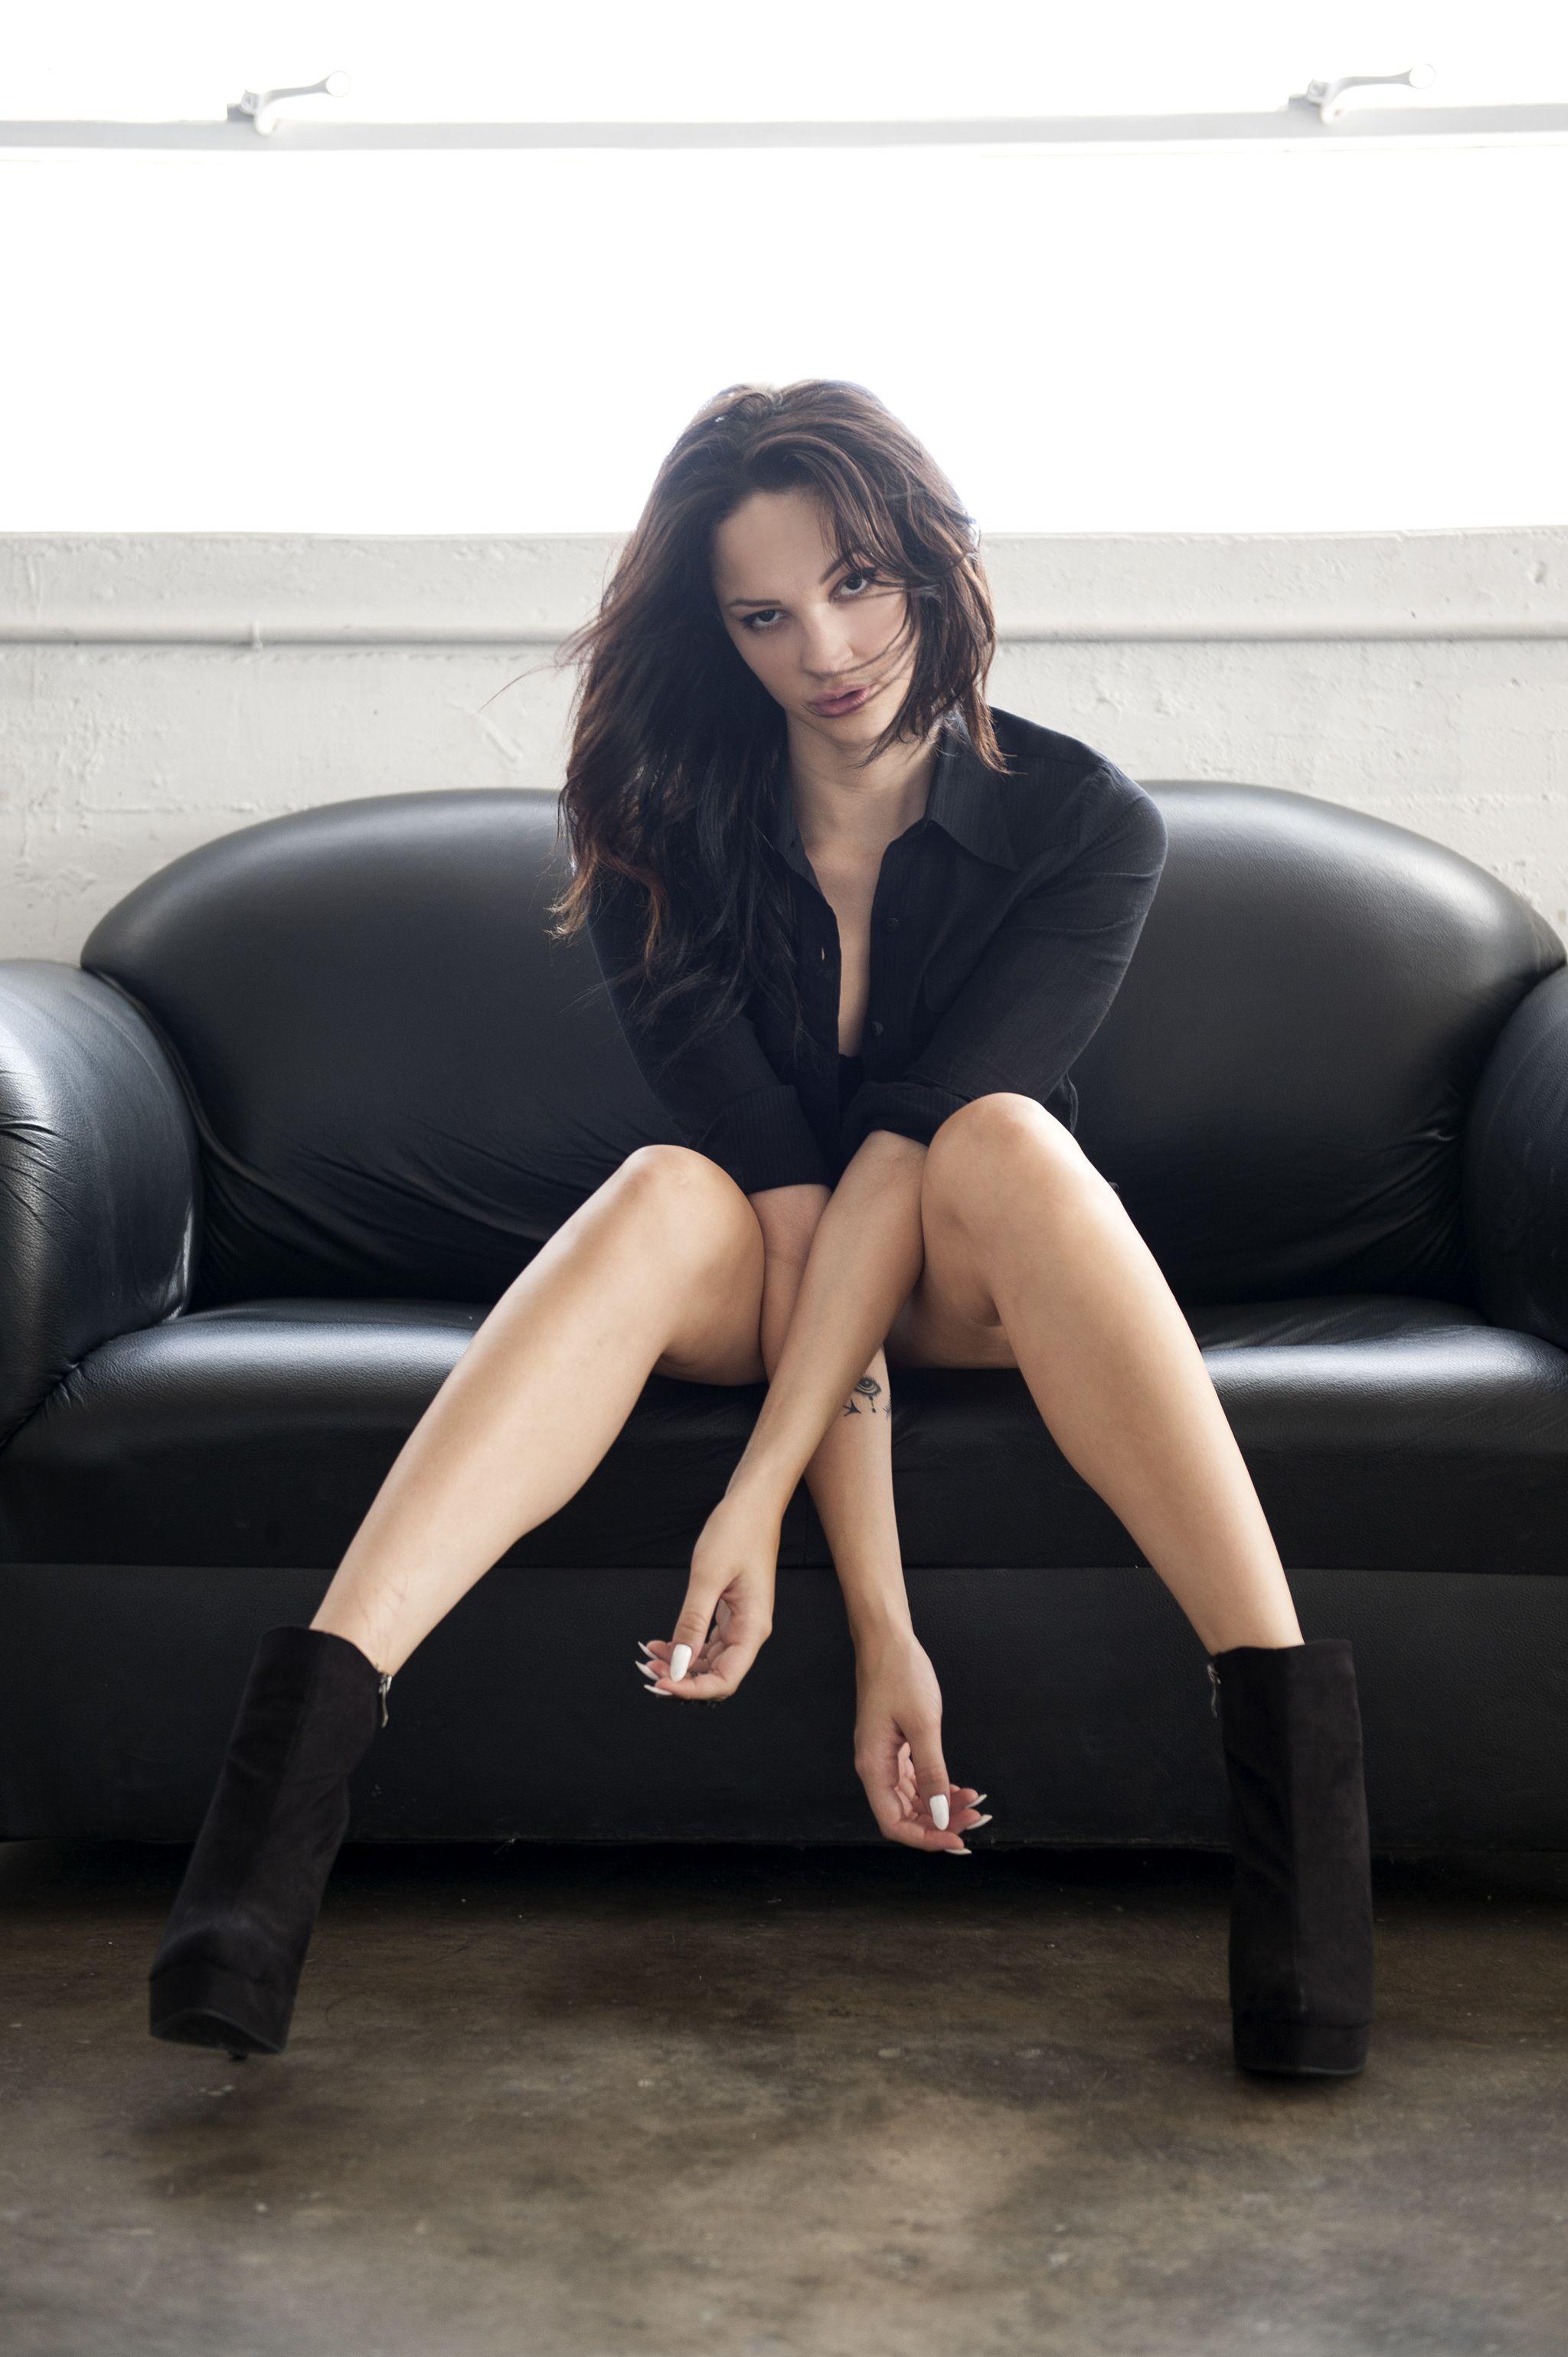 Hot Ruby Modine nude photos 2019